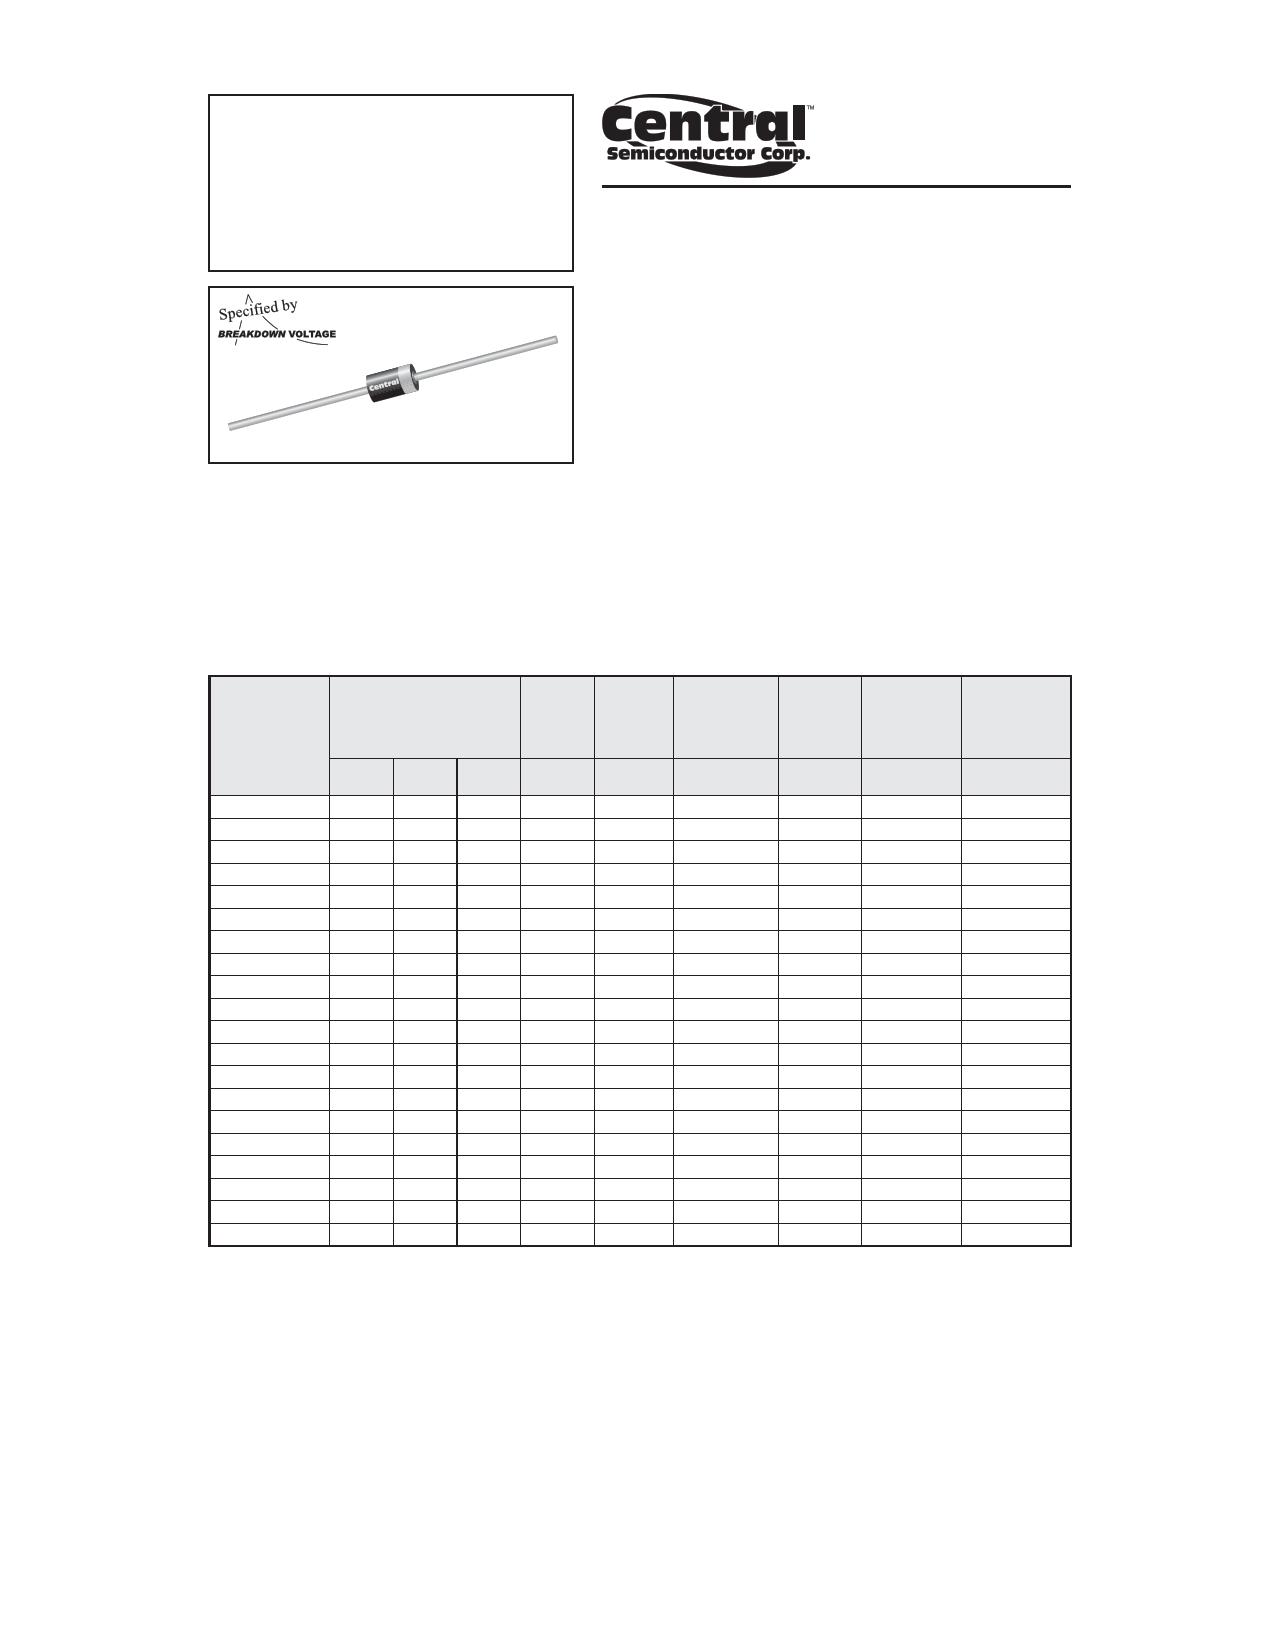 1.5CE7.5A datasheet